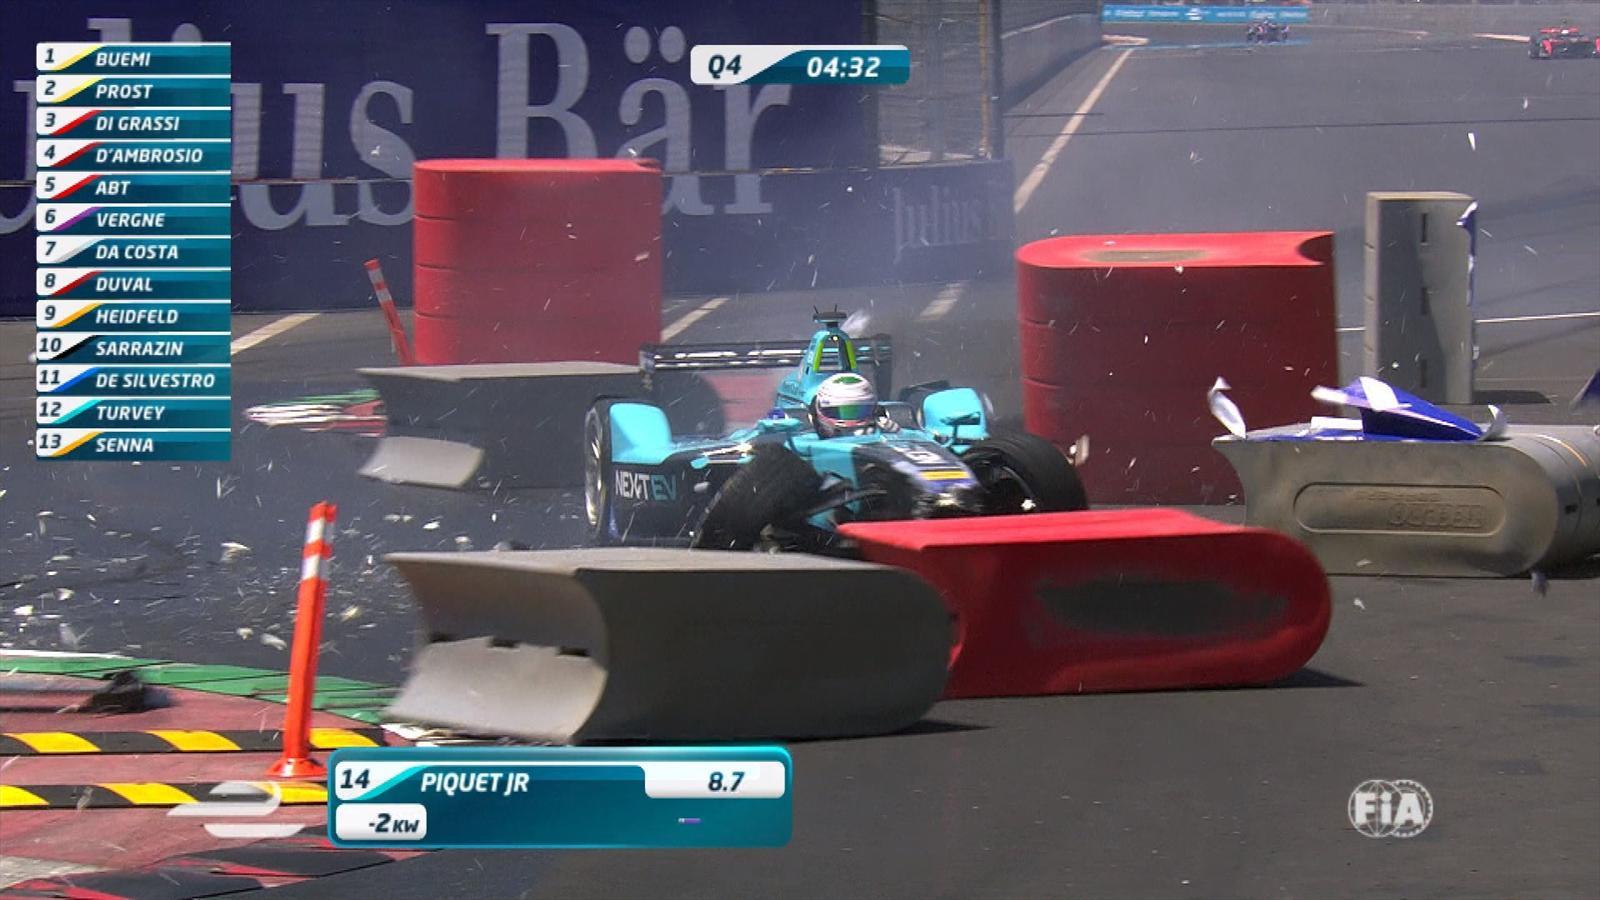 Nelson Piquet Jr suffers heavy crash in Formula E qualifying